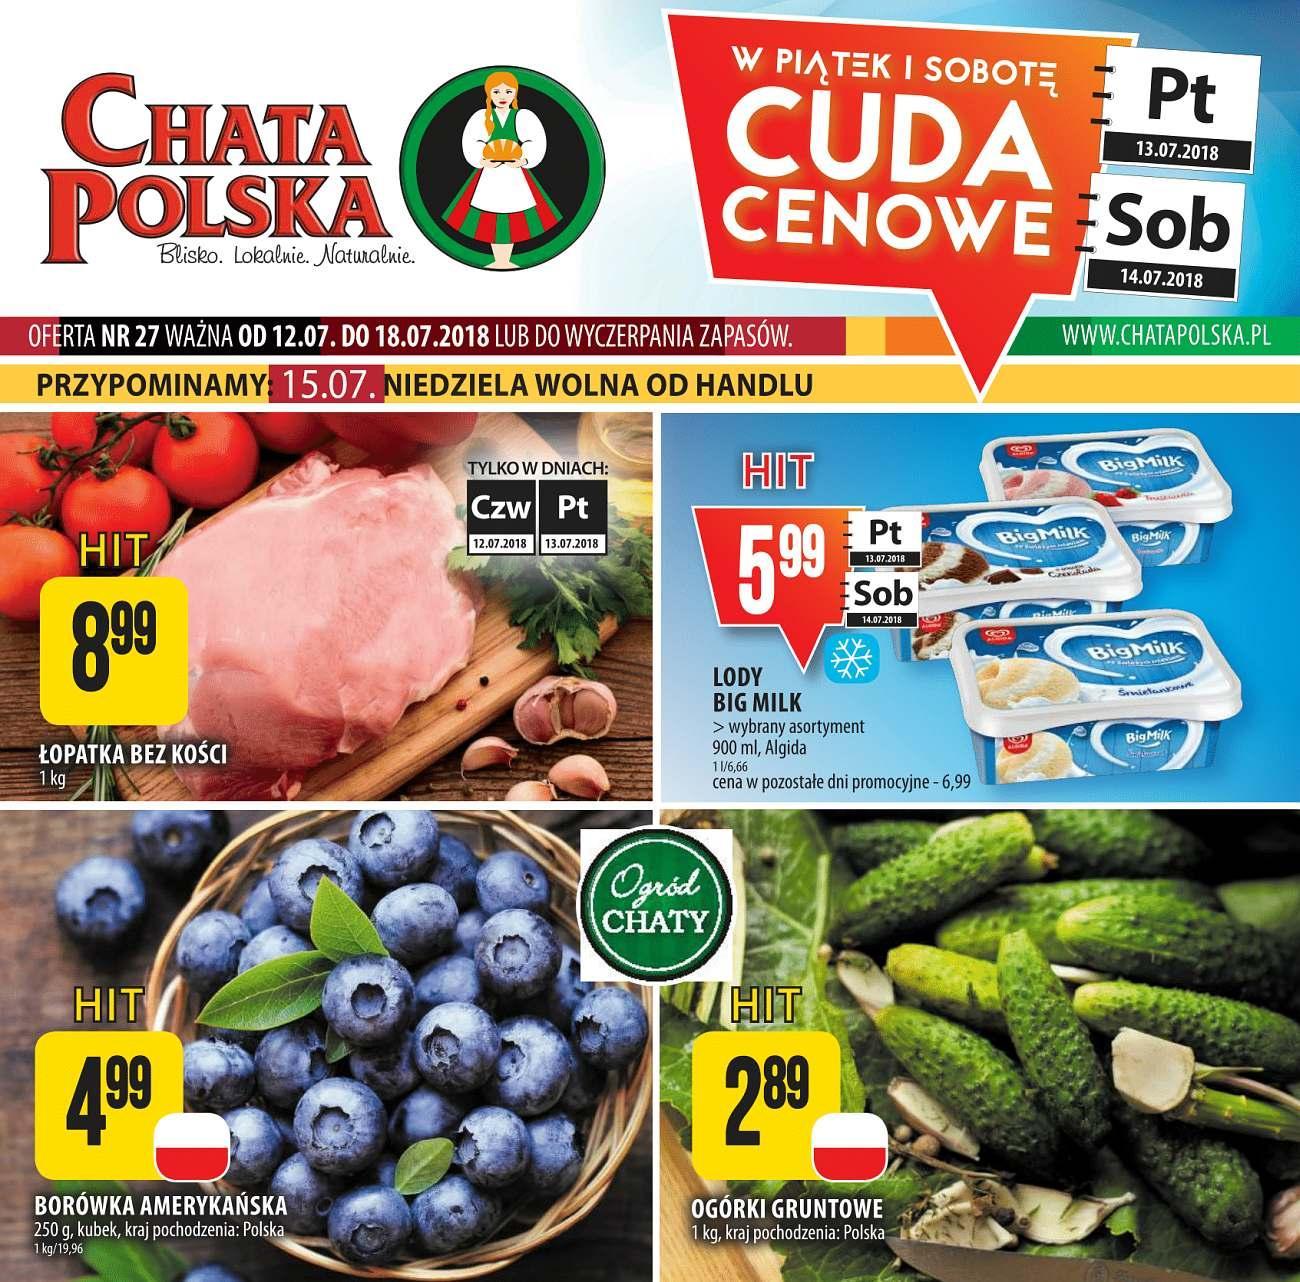 Gazetka promocyjna Chata Polska do 18/07/2018 str.1